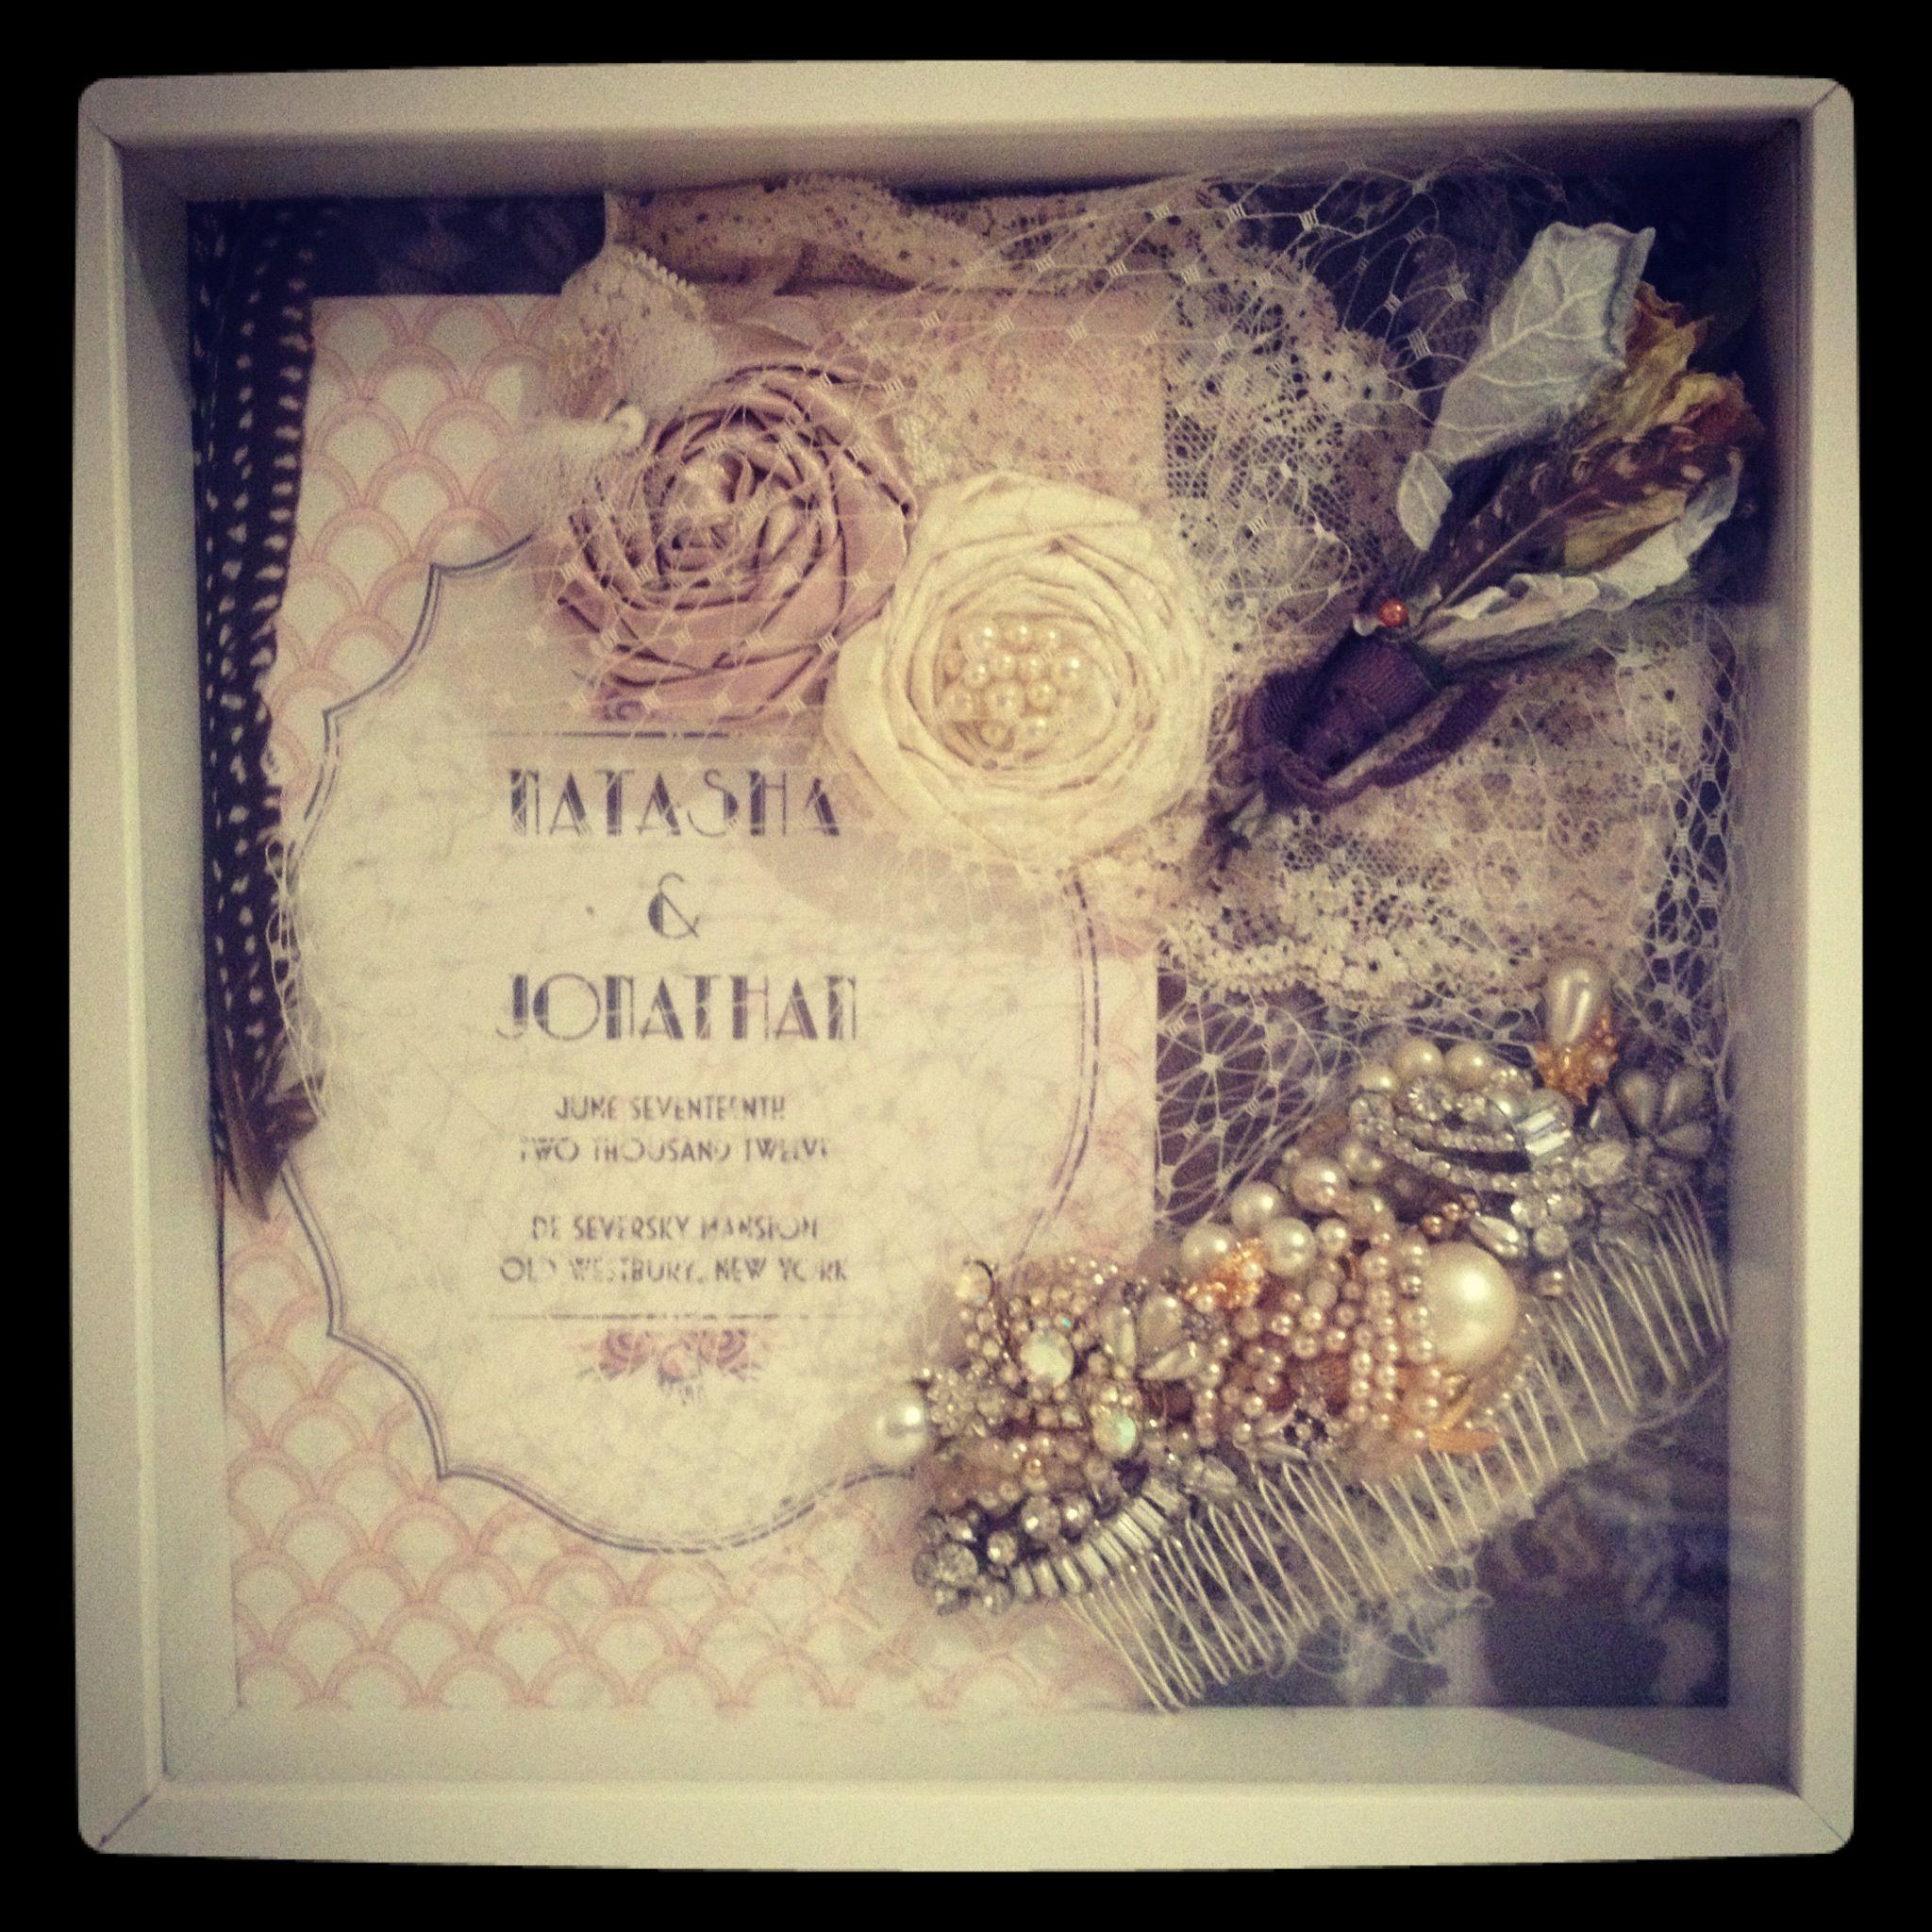 Post Wedding Gifts: Wedding Shadow Box! A Great Way To Display Keepsakes, As